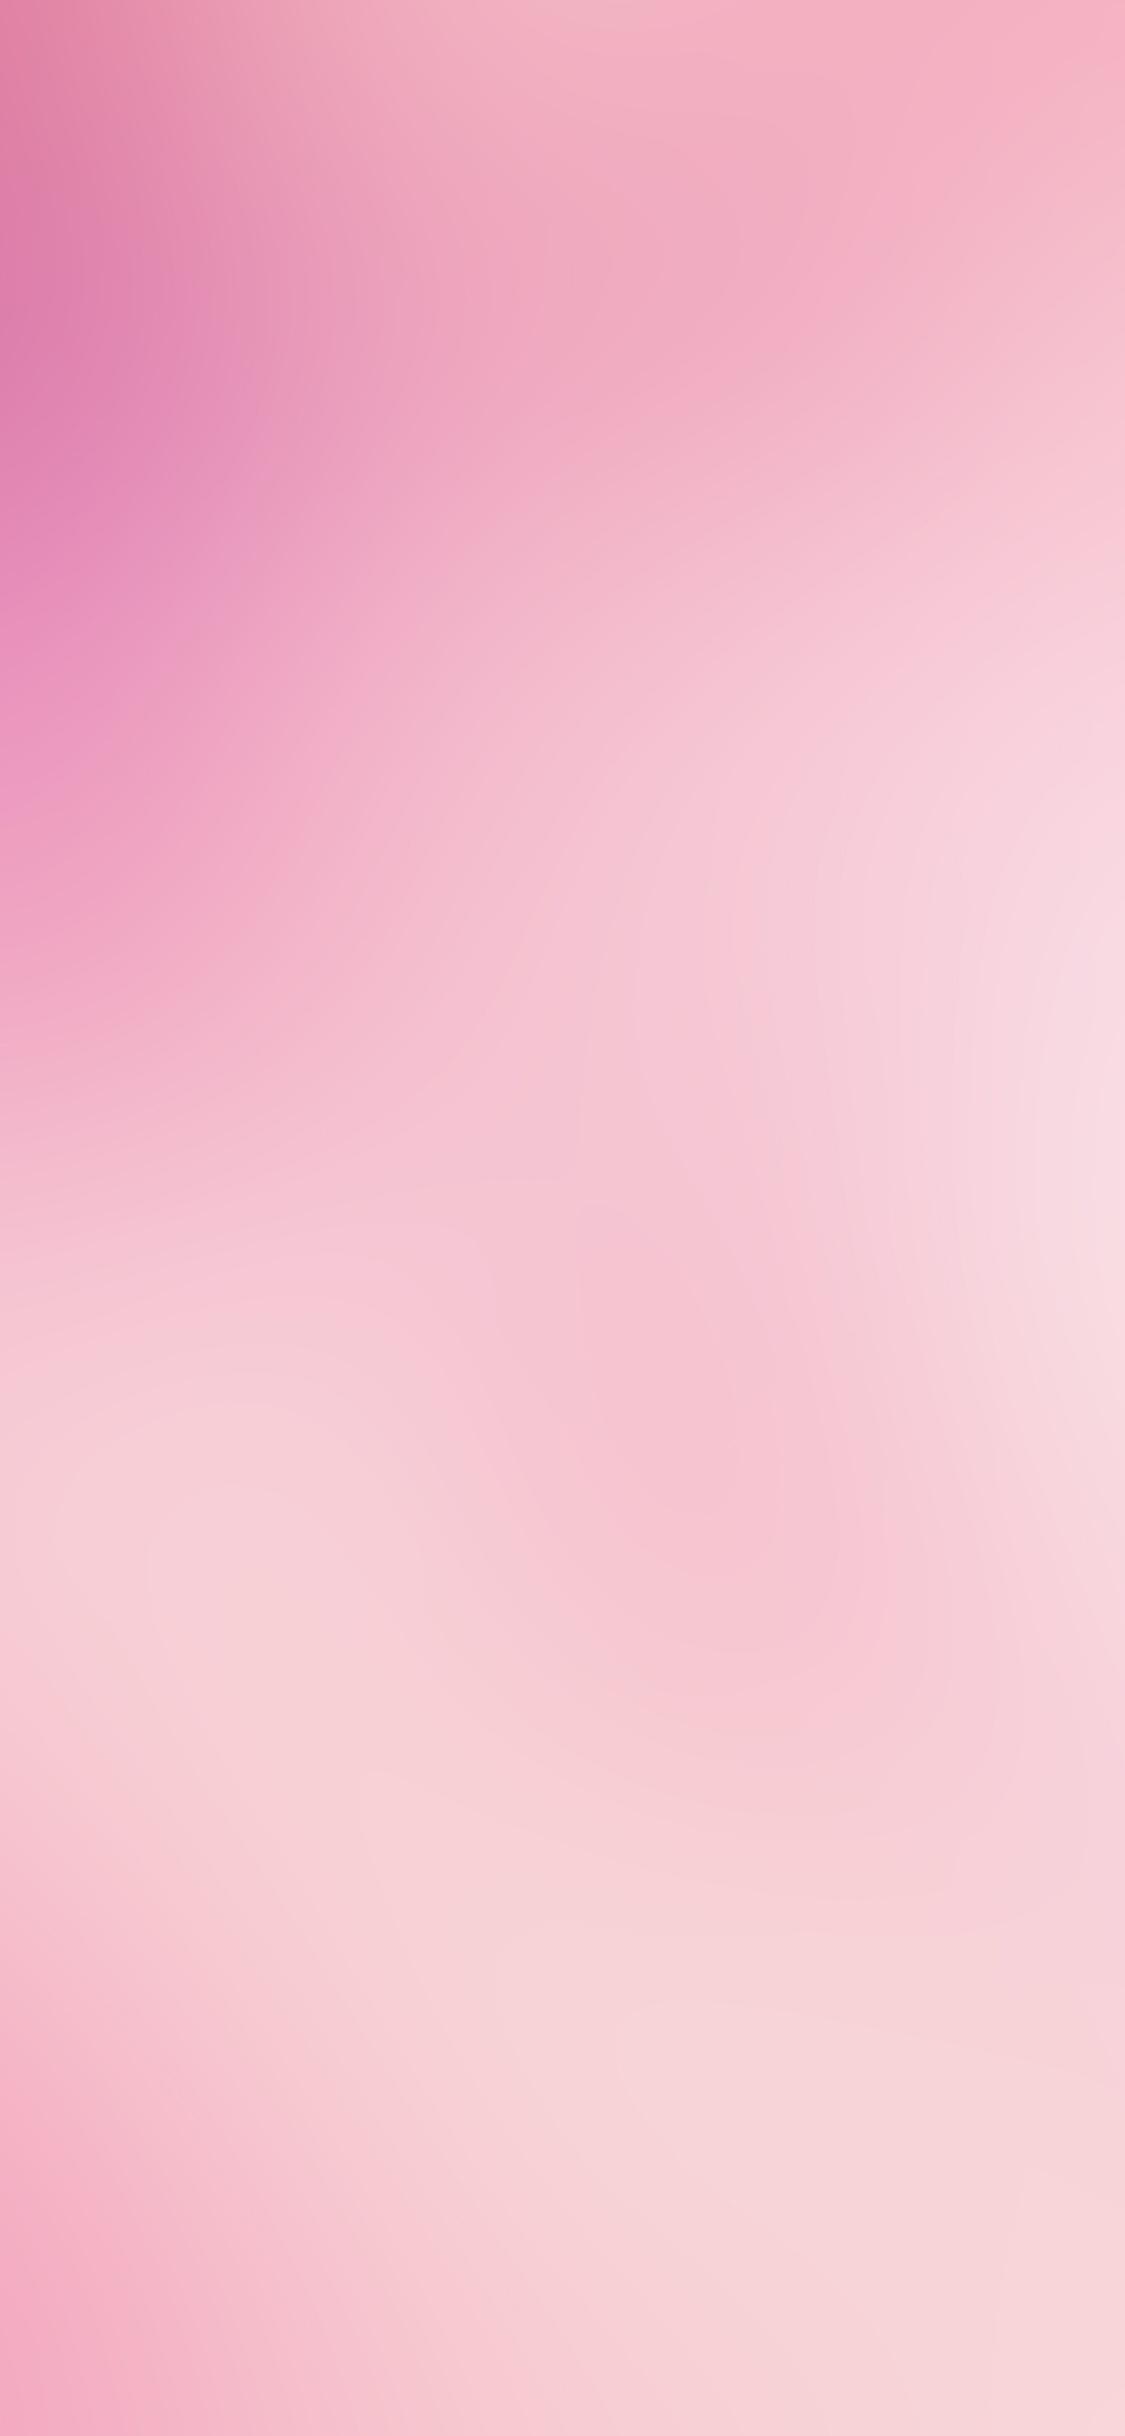 Iphonepapers Se72 Spring Pink Cherry Blossom Gradation Blur